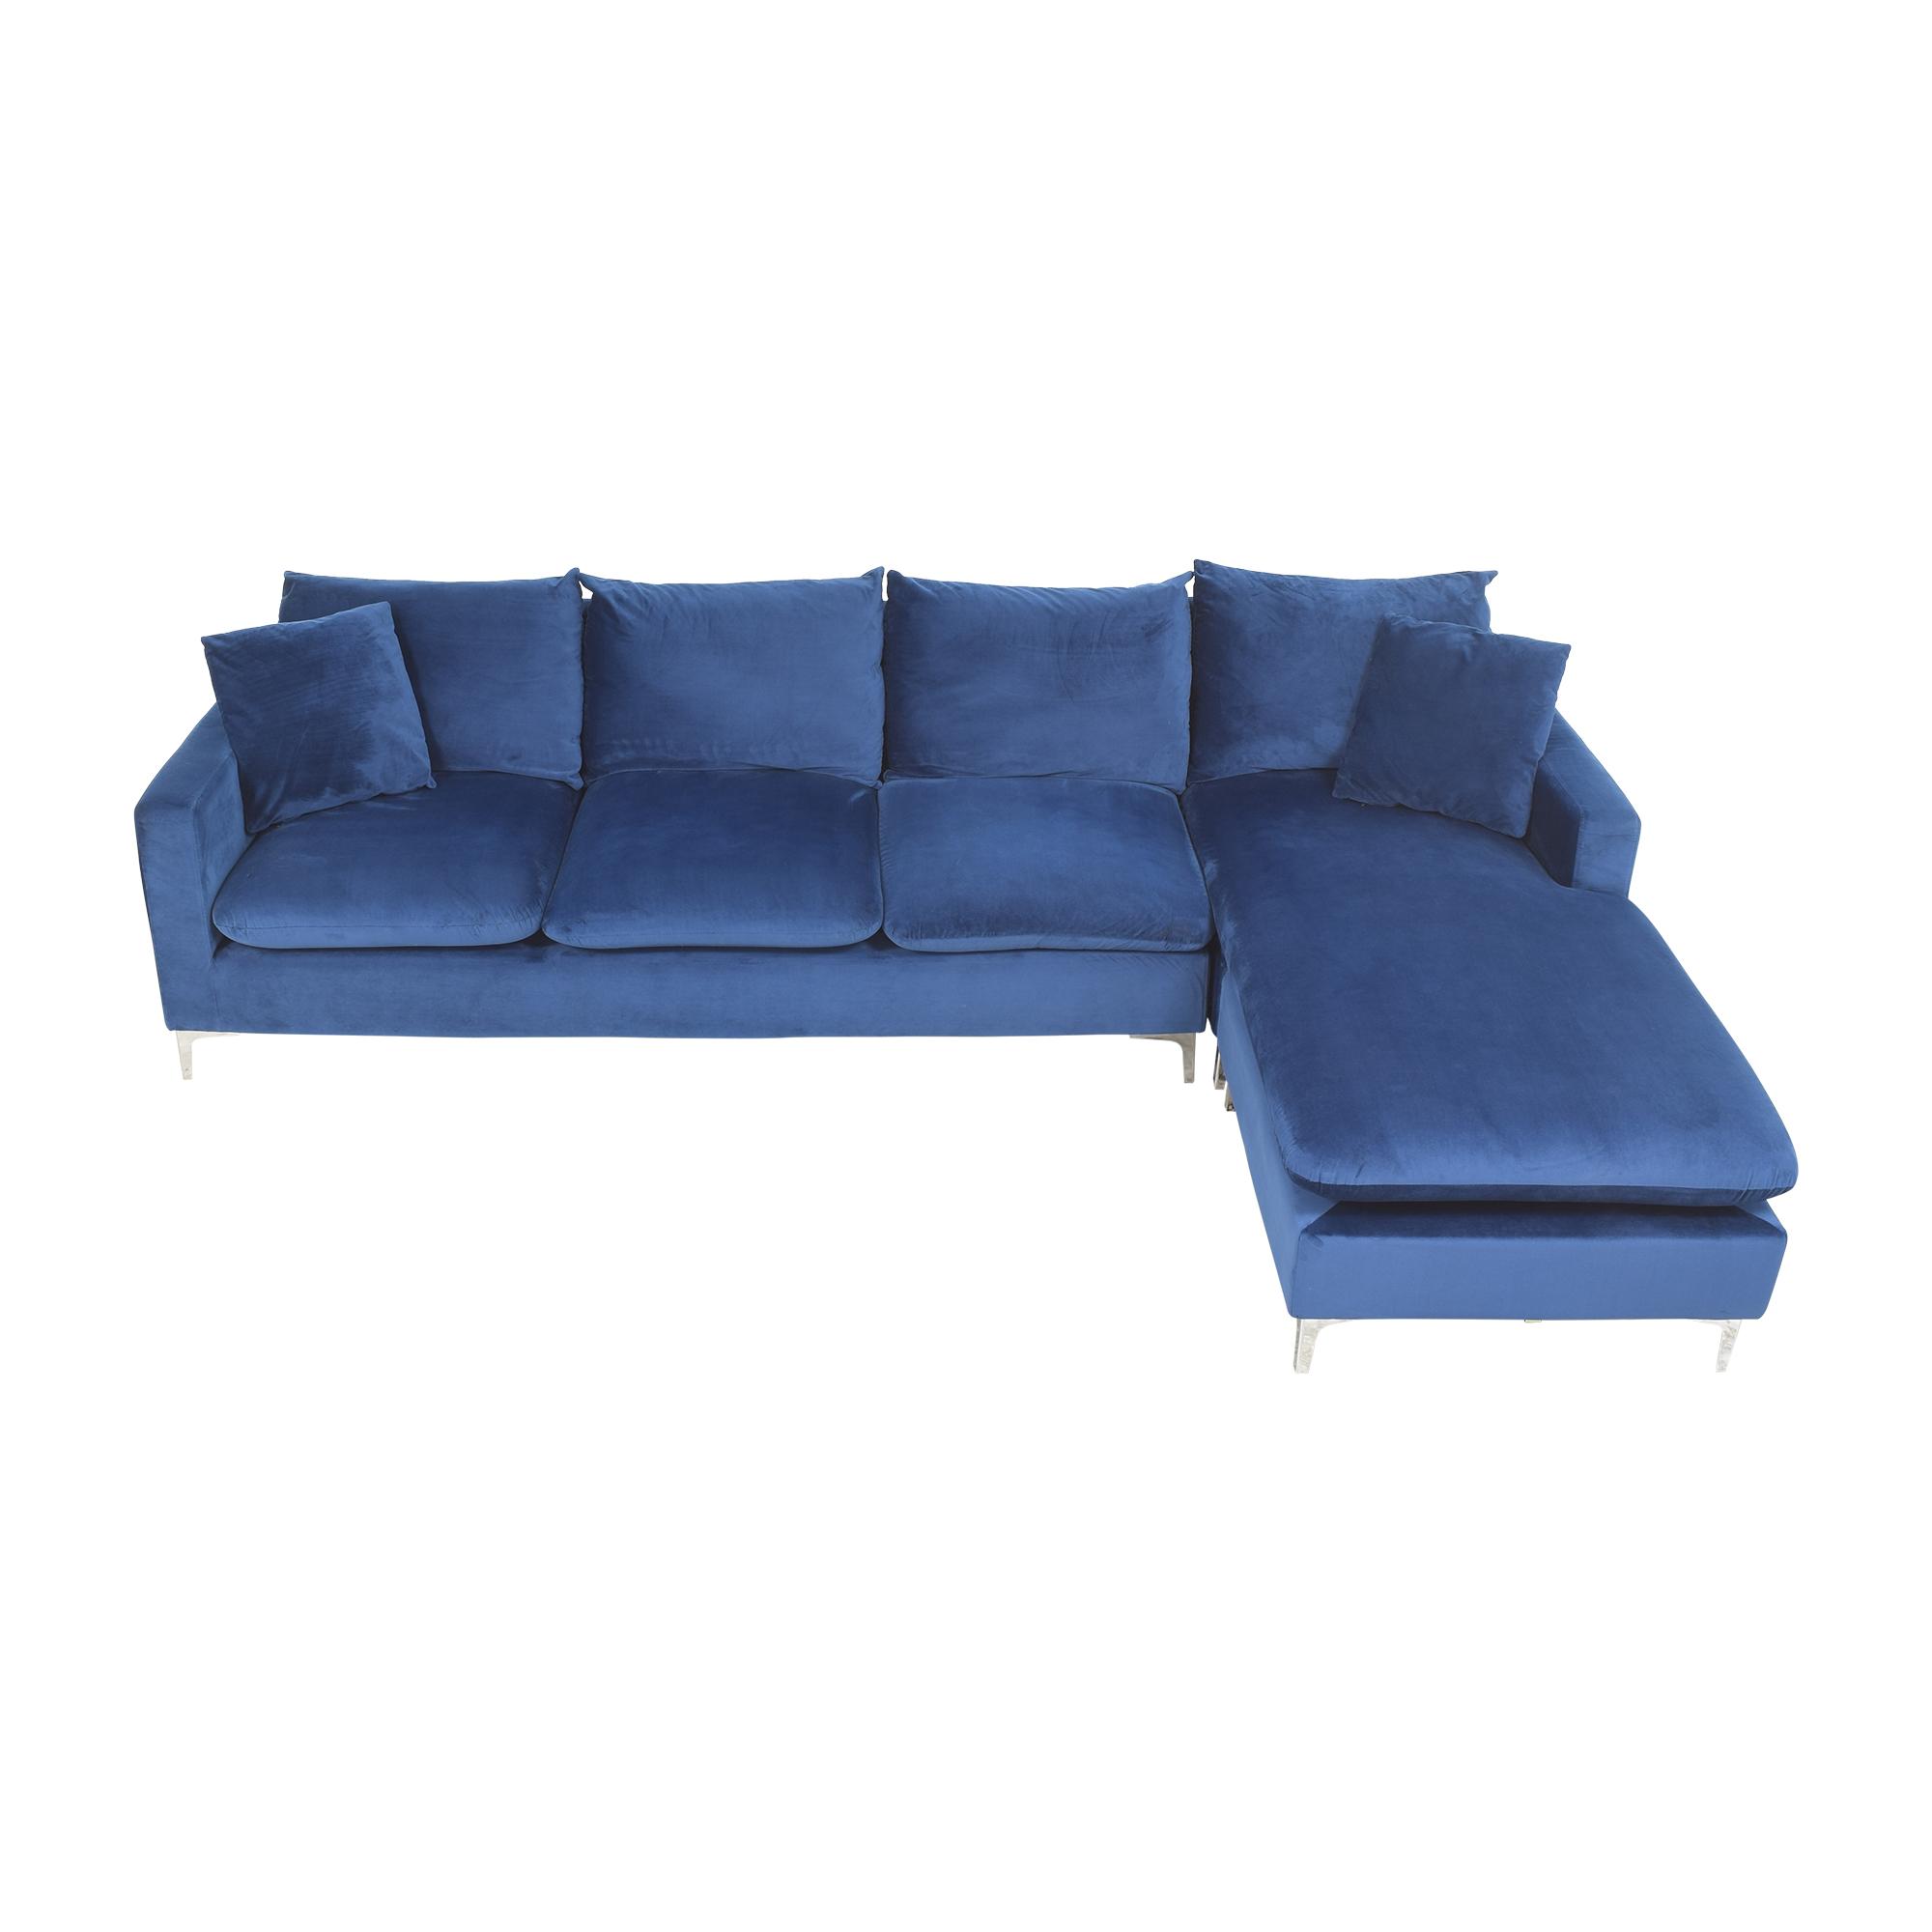 Wayfair Wayfair Boutwell Reversible Sectional Sofa discount